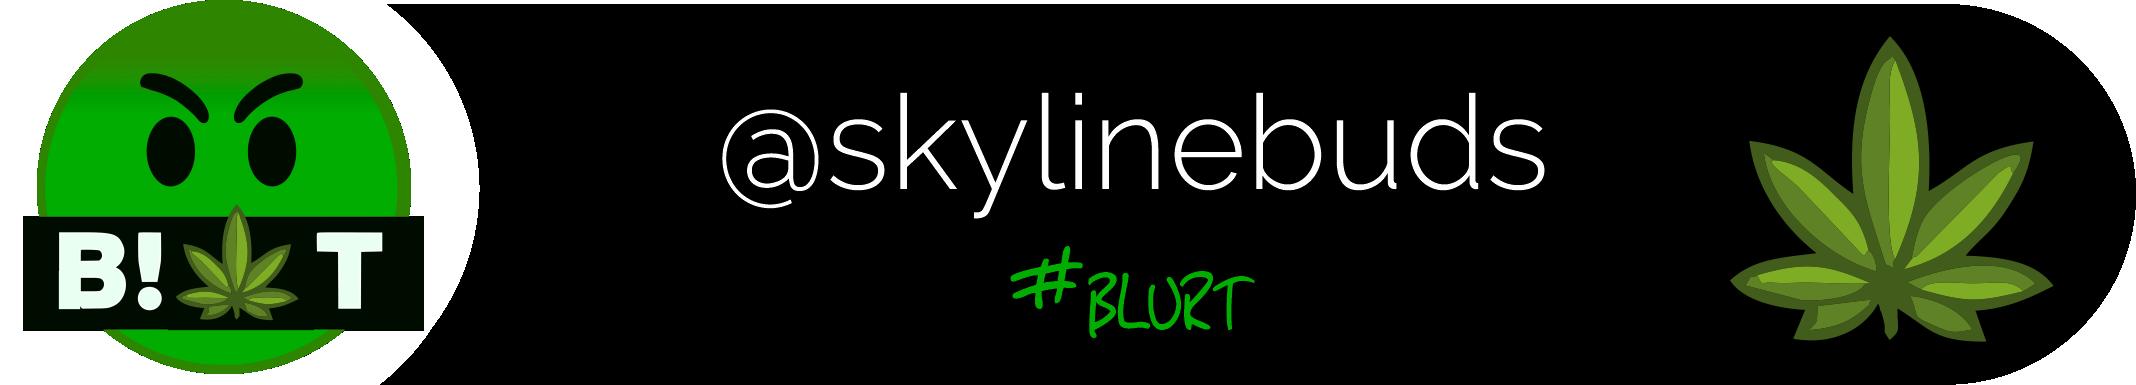 Blurt_skylinebuds_2.png